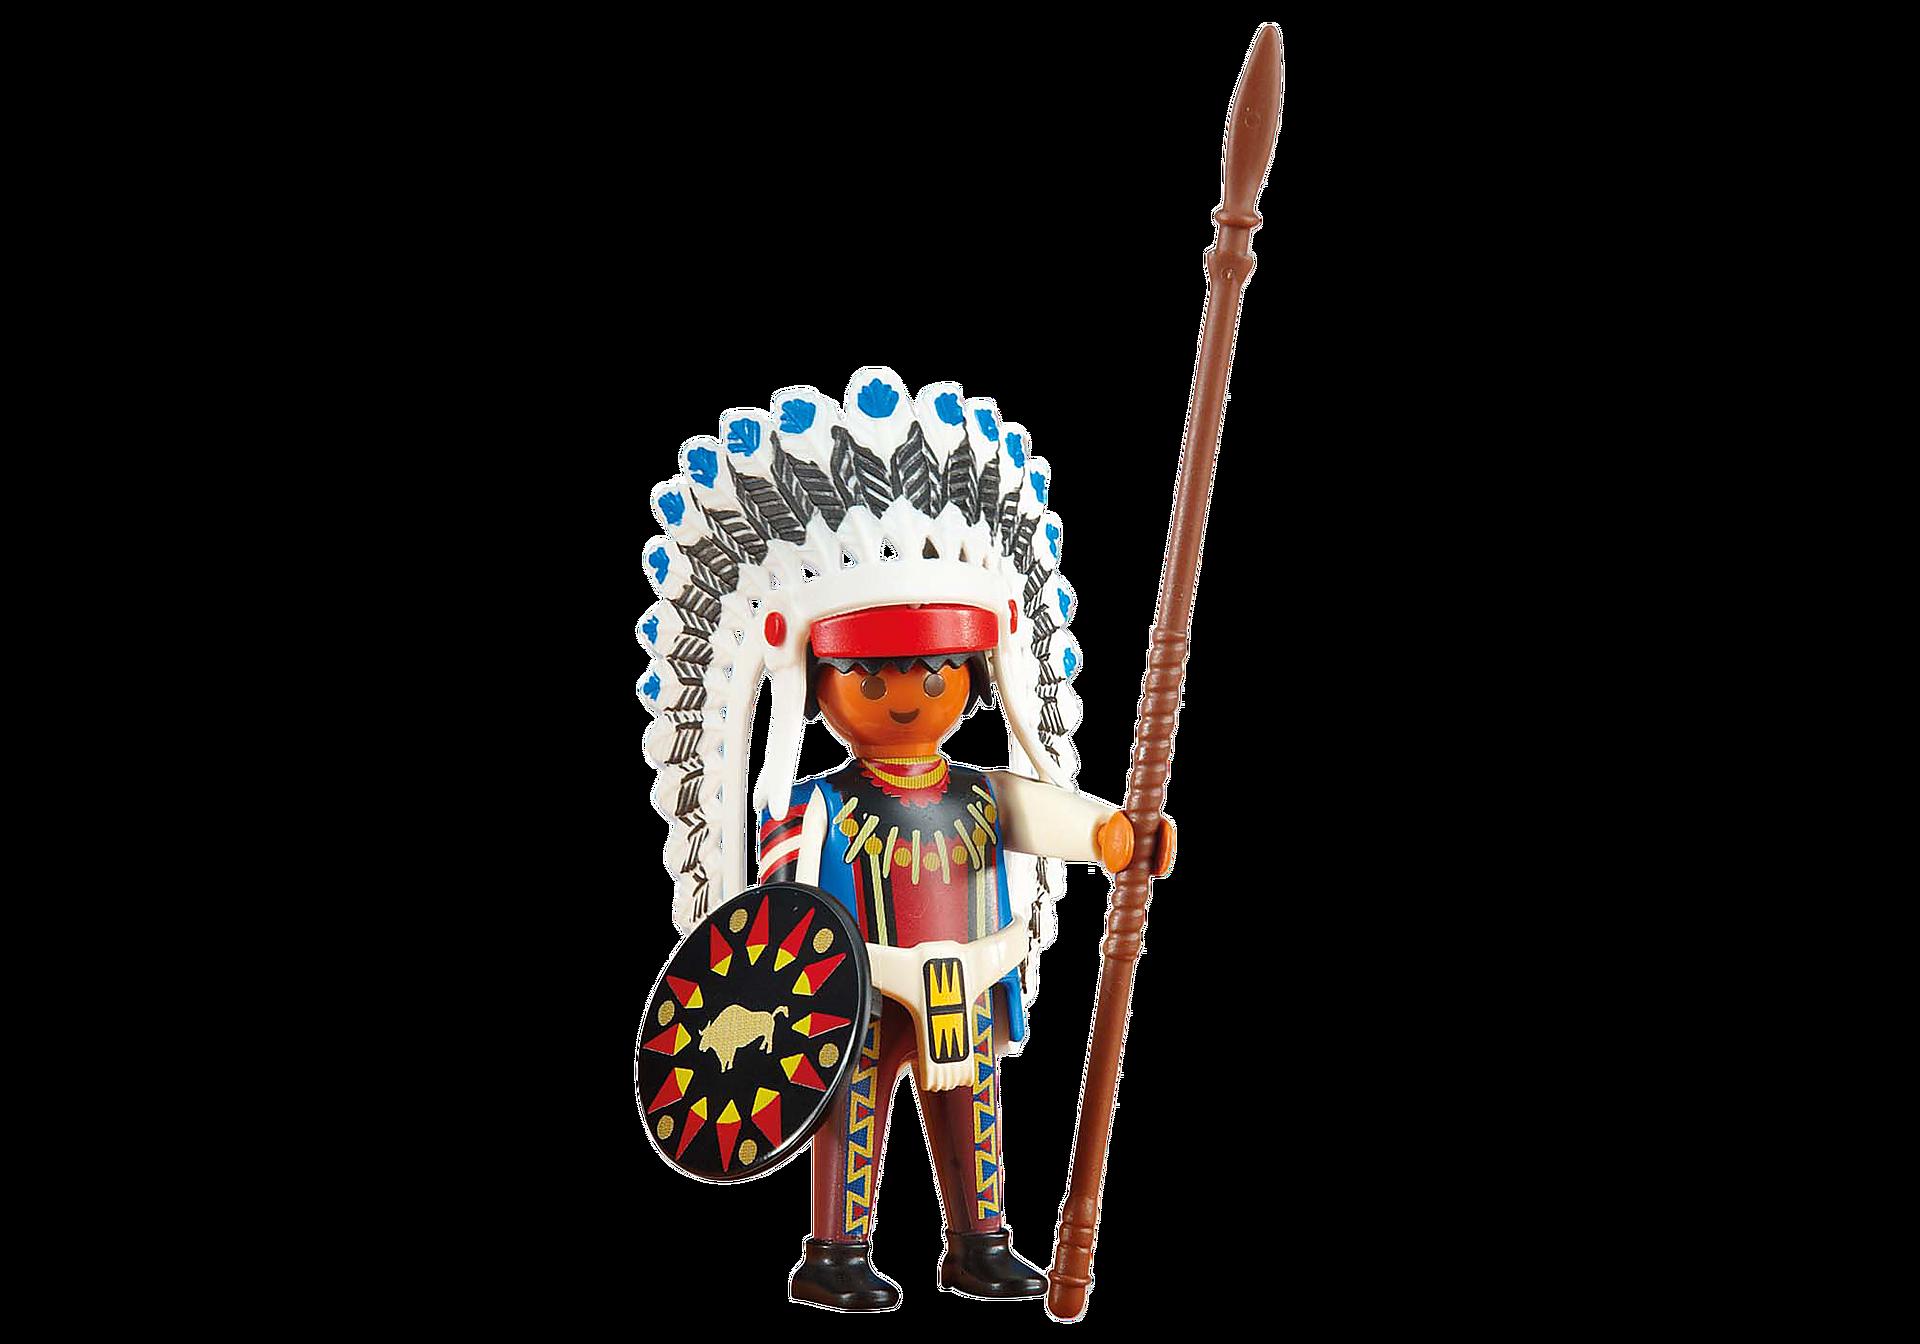 6271 Inheemse leider  zoom image1